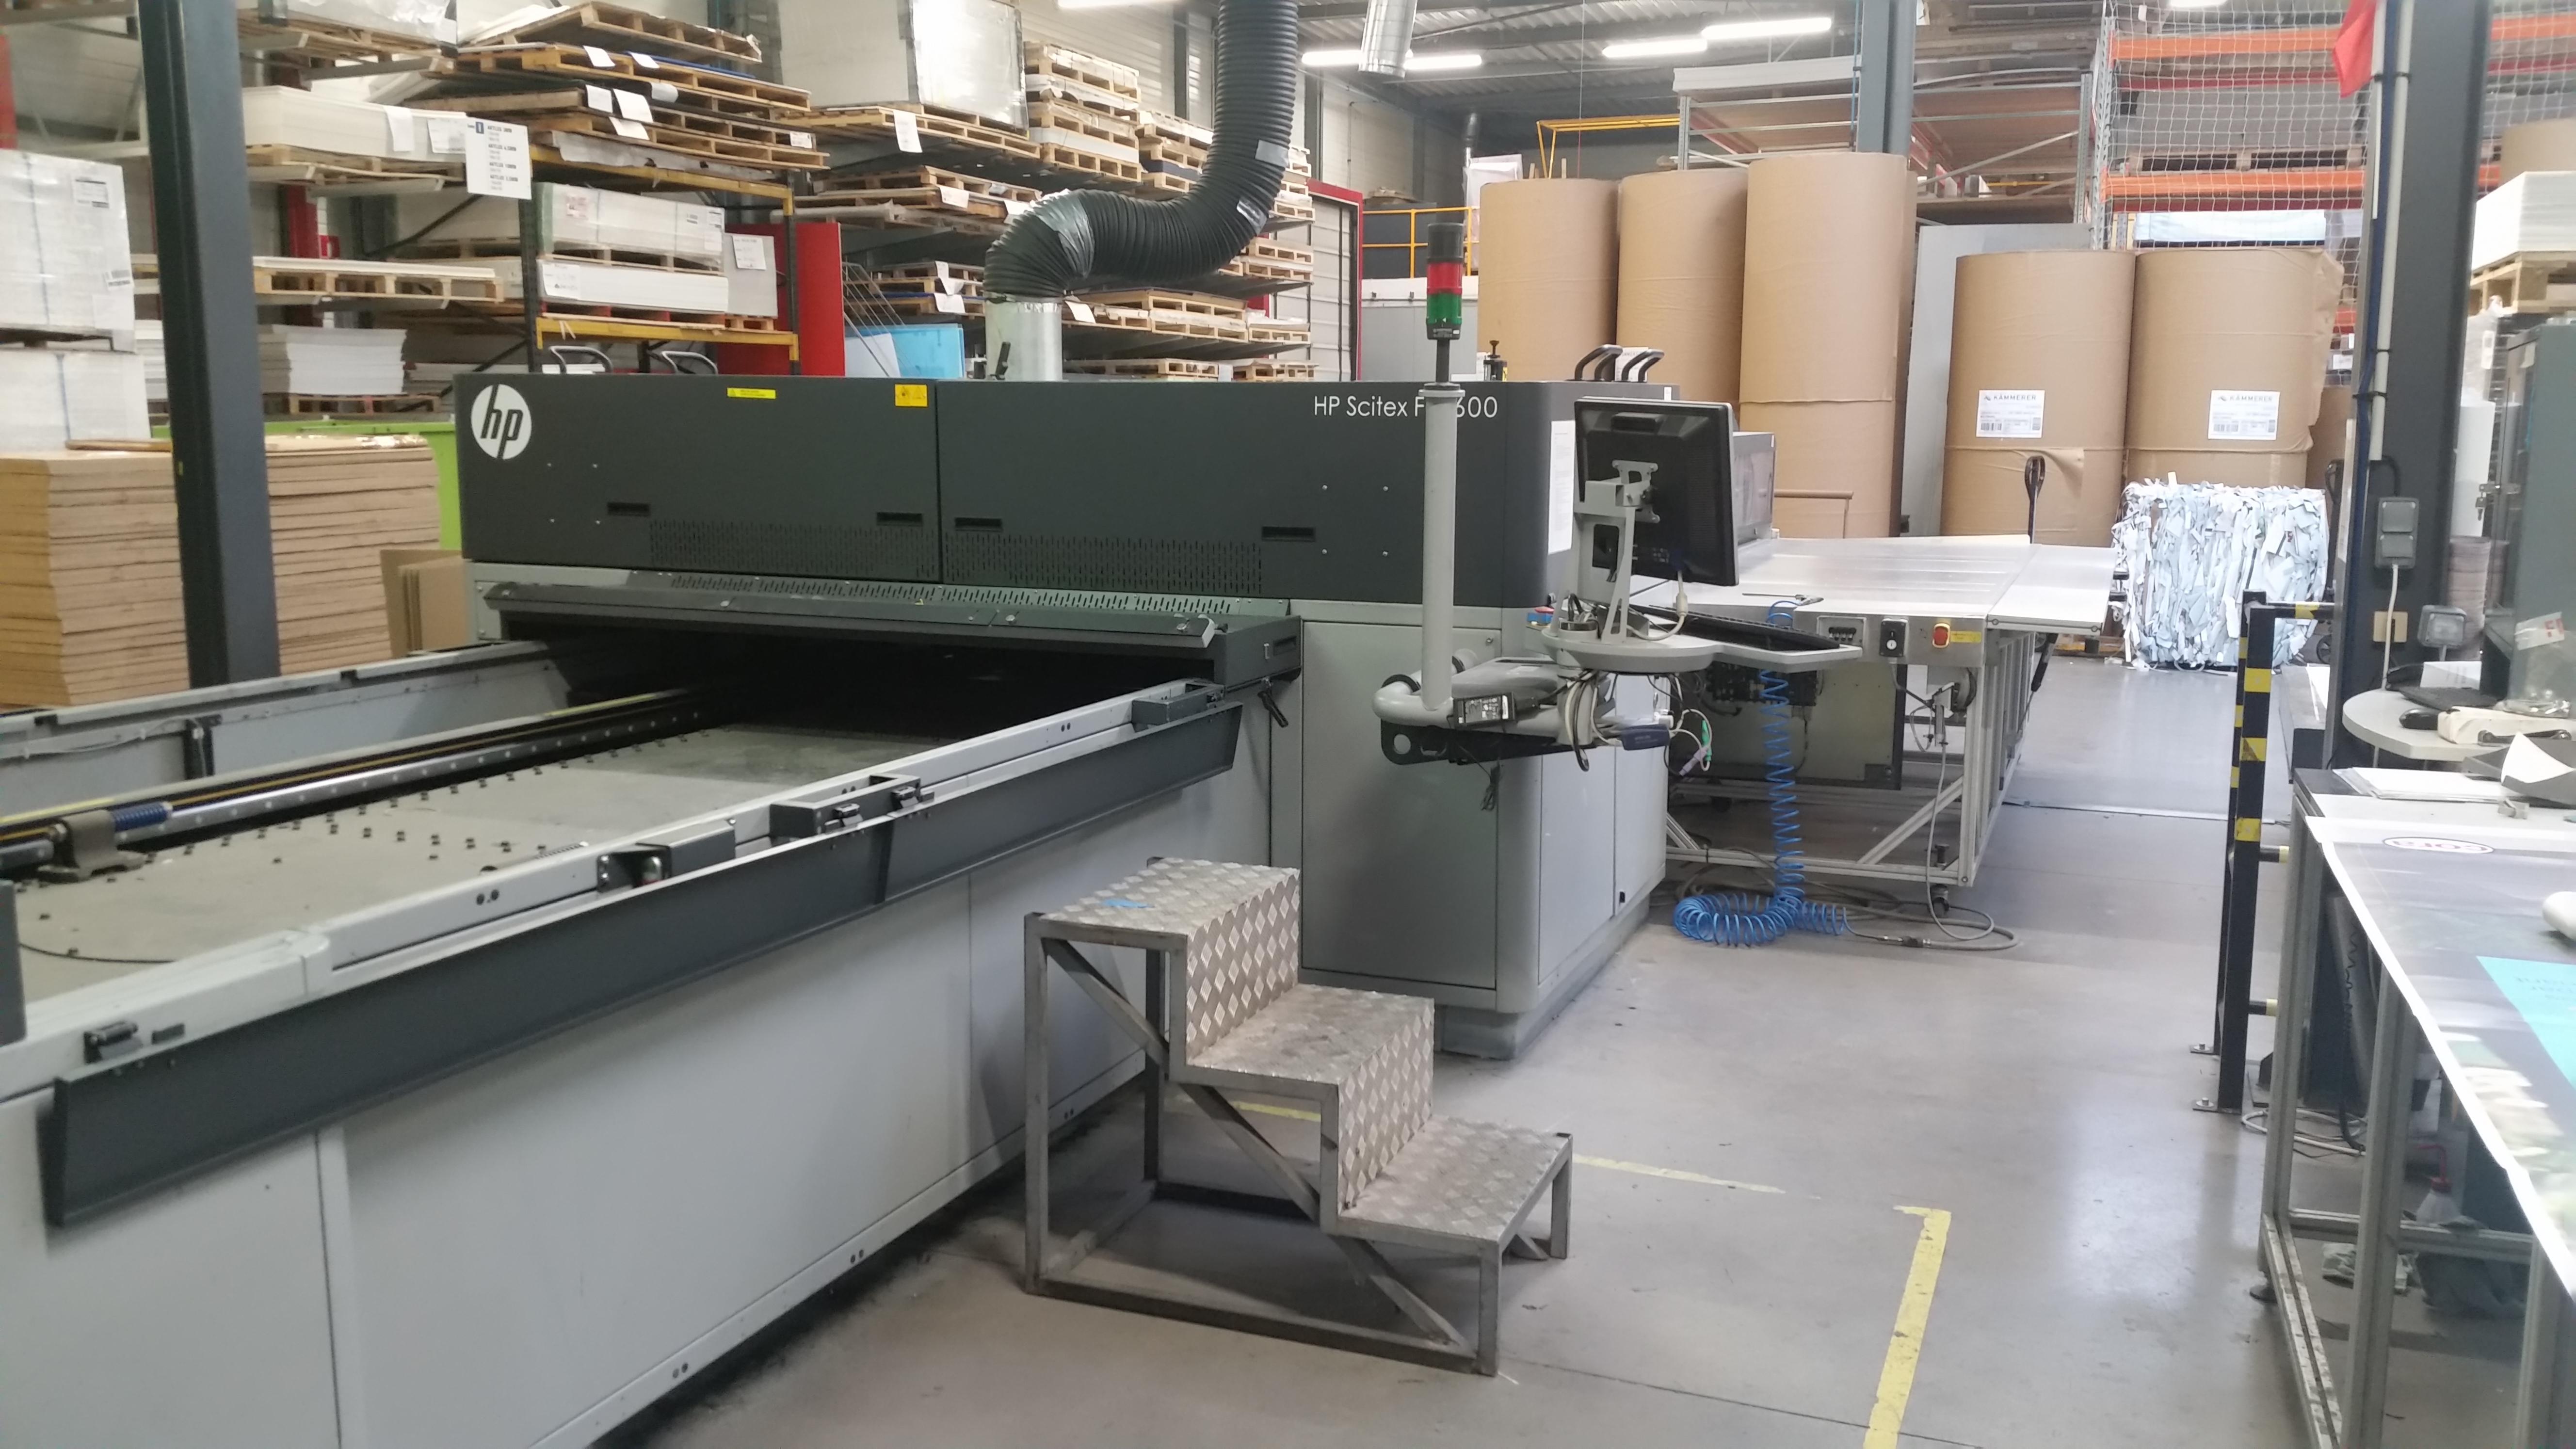 Hp Scitex FB 7600 Digital press - Exapro